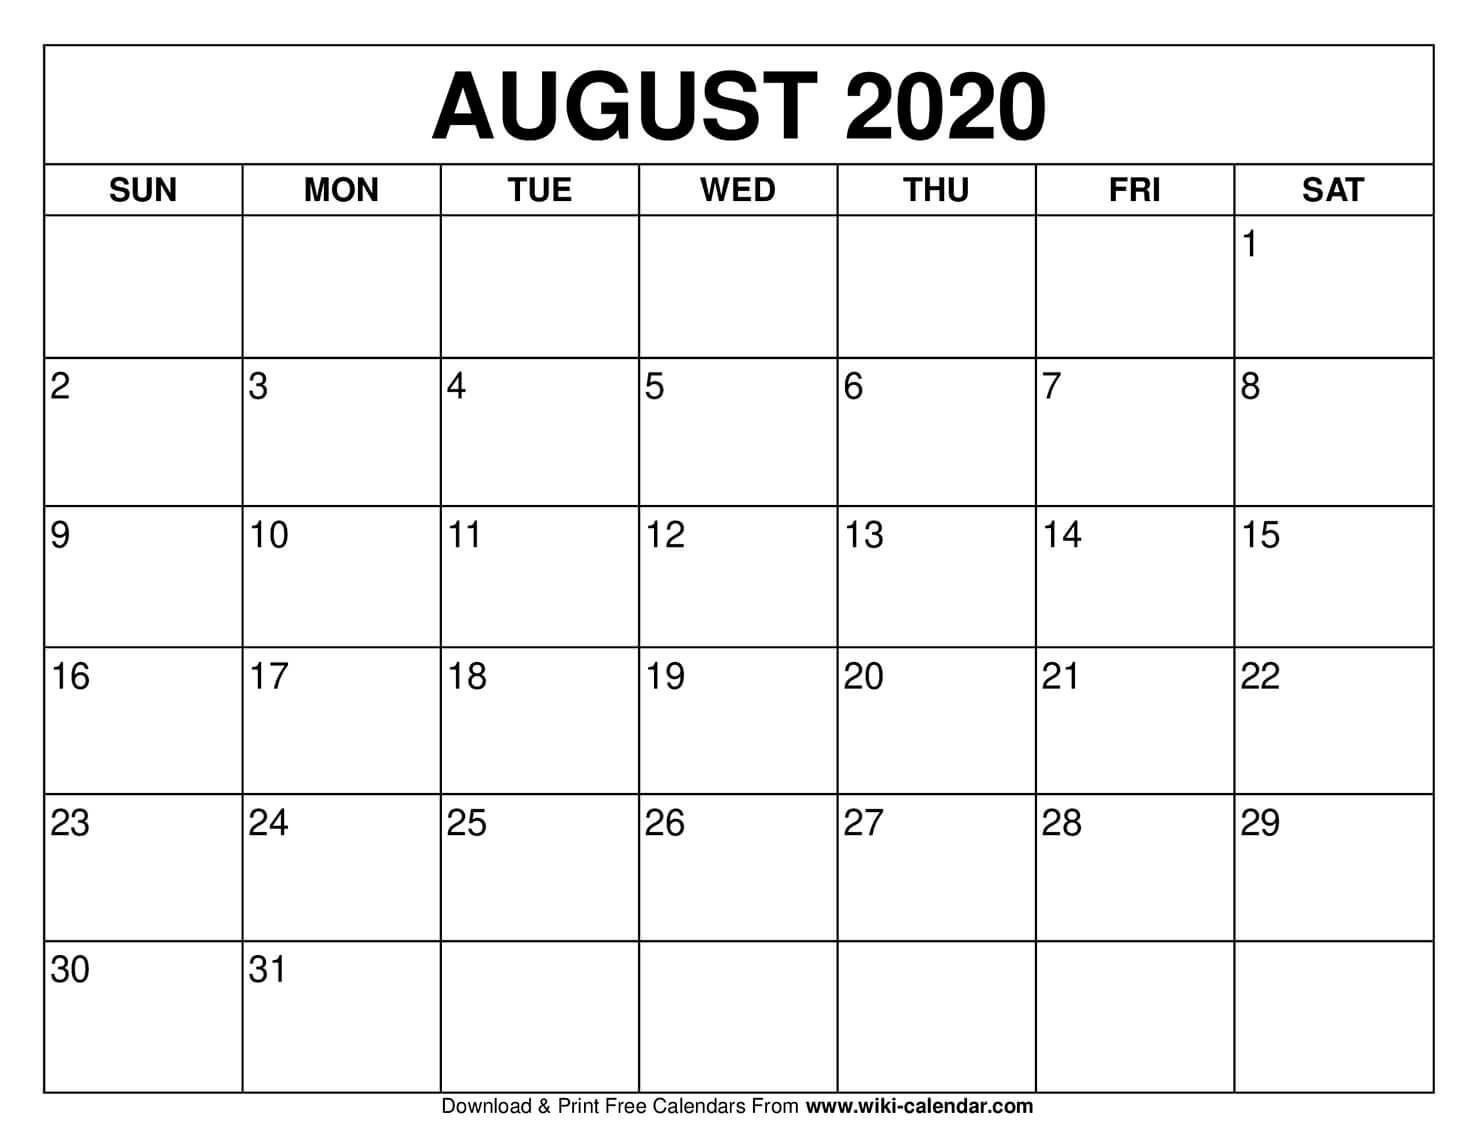 Free Printable August 2020 Calendars-Printable October 2021 Calendar On An 8.5 X 11Paper